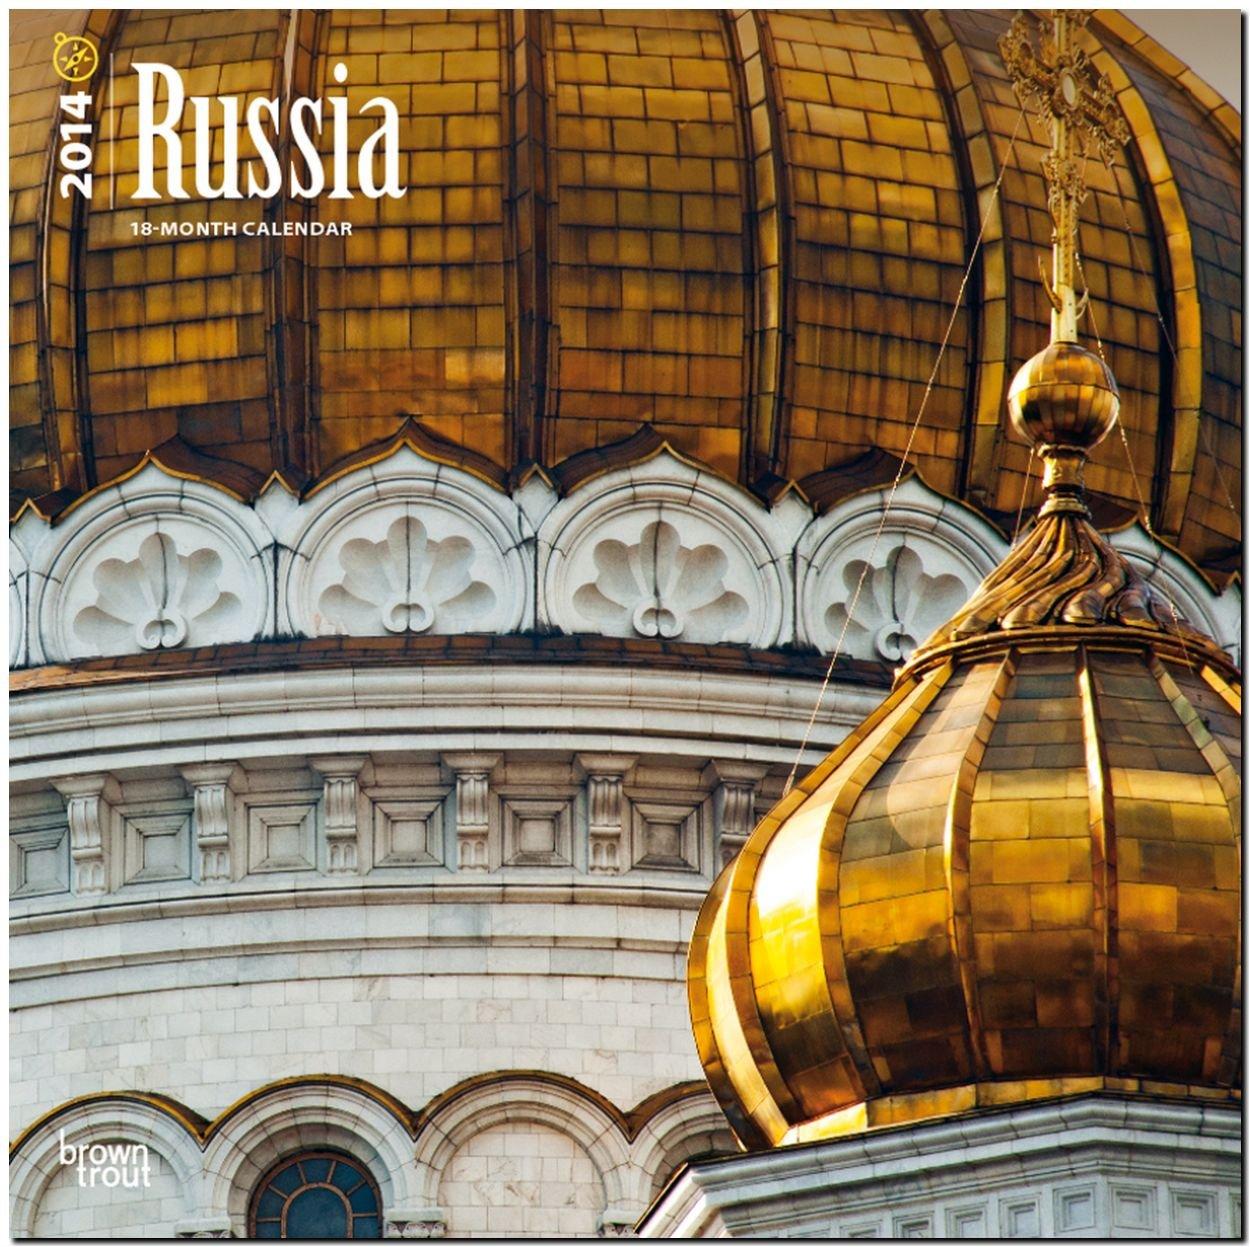 Russia 2014 - Russland: Original BrownTrout-Kalender [Mehrsprachig] [Kalender]